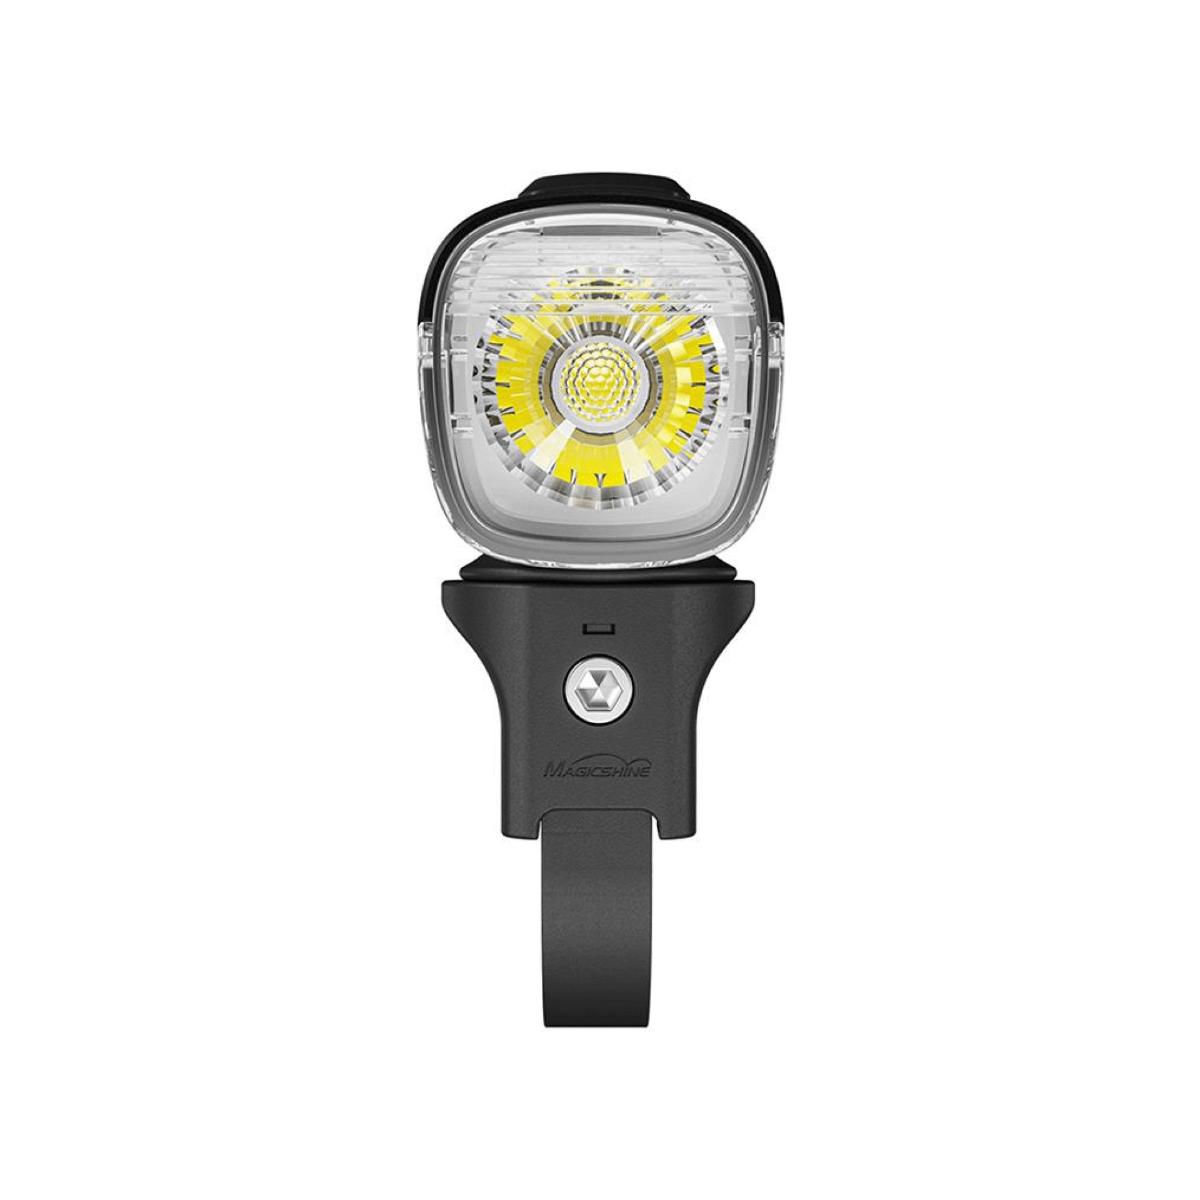 Olight Magicshine RN1200 Black Bicycle Headlight 1200 Lumens LED Bike Front Light